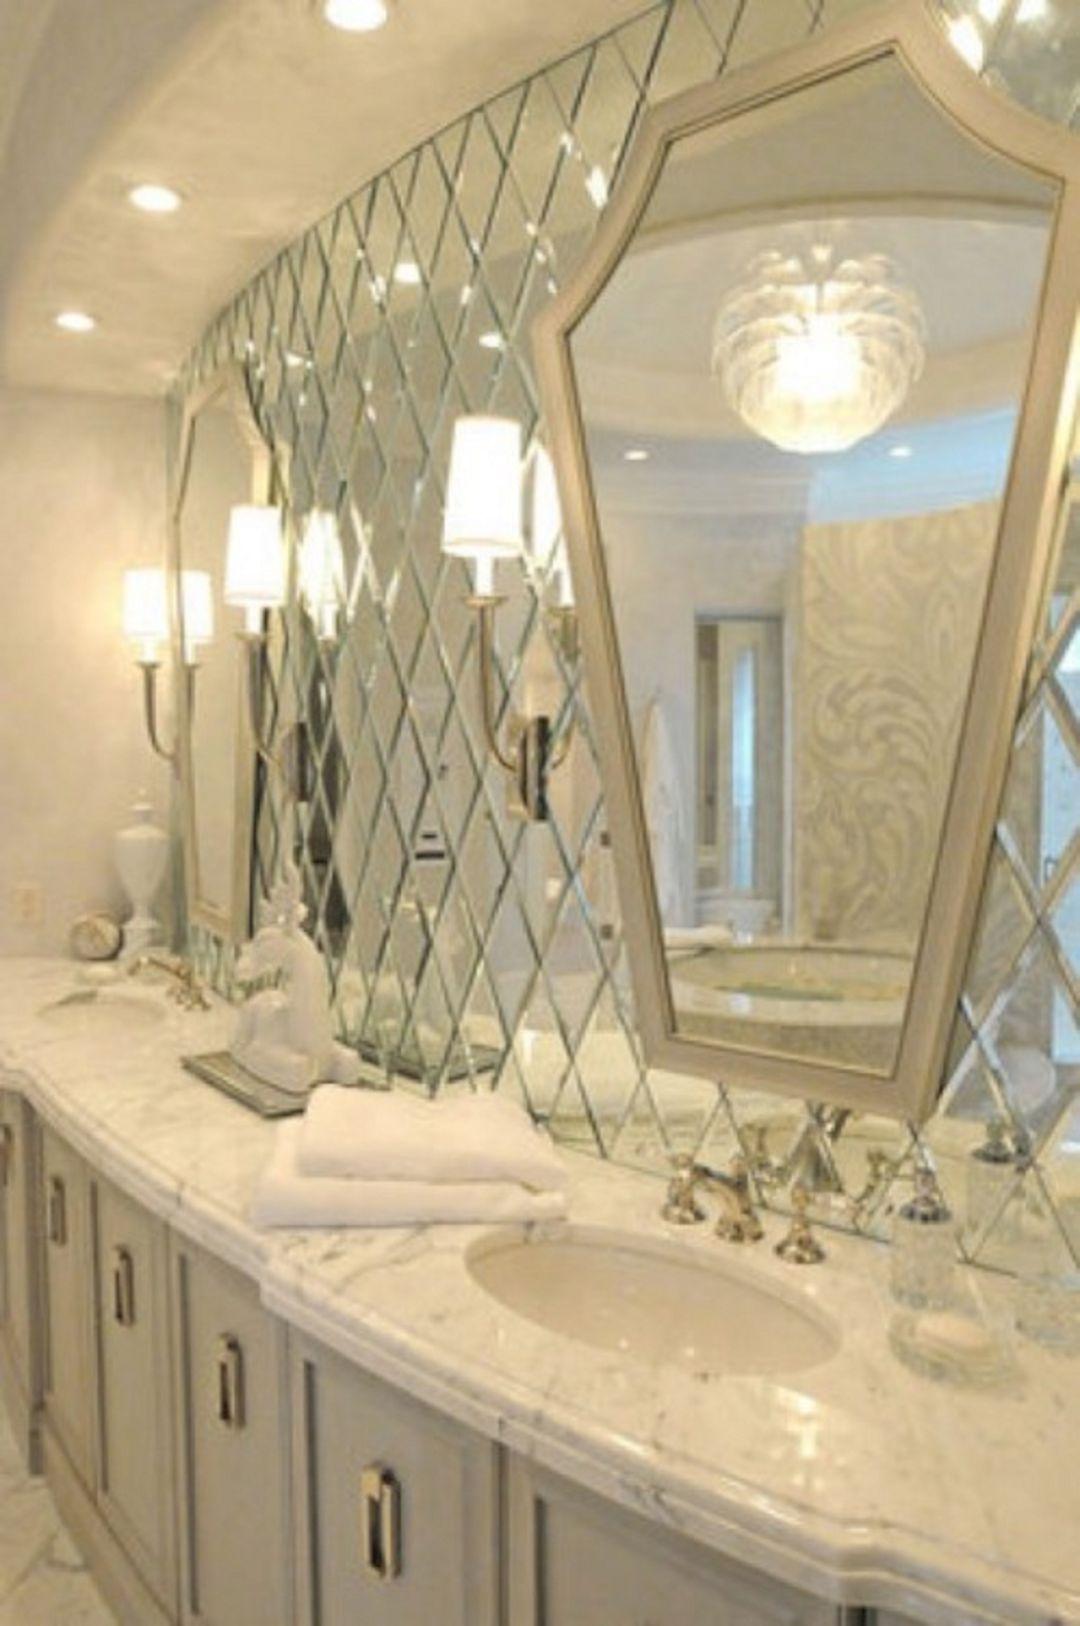 Adhesive Wall Tiles Bedroom